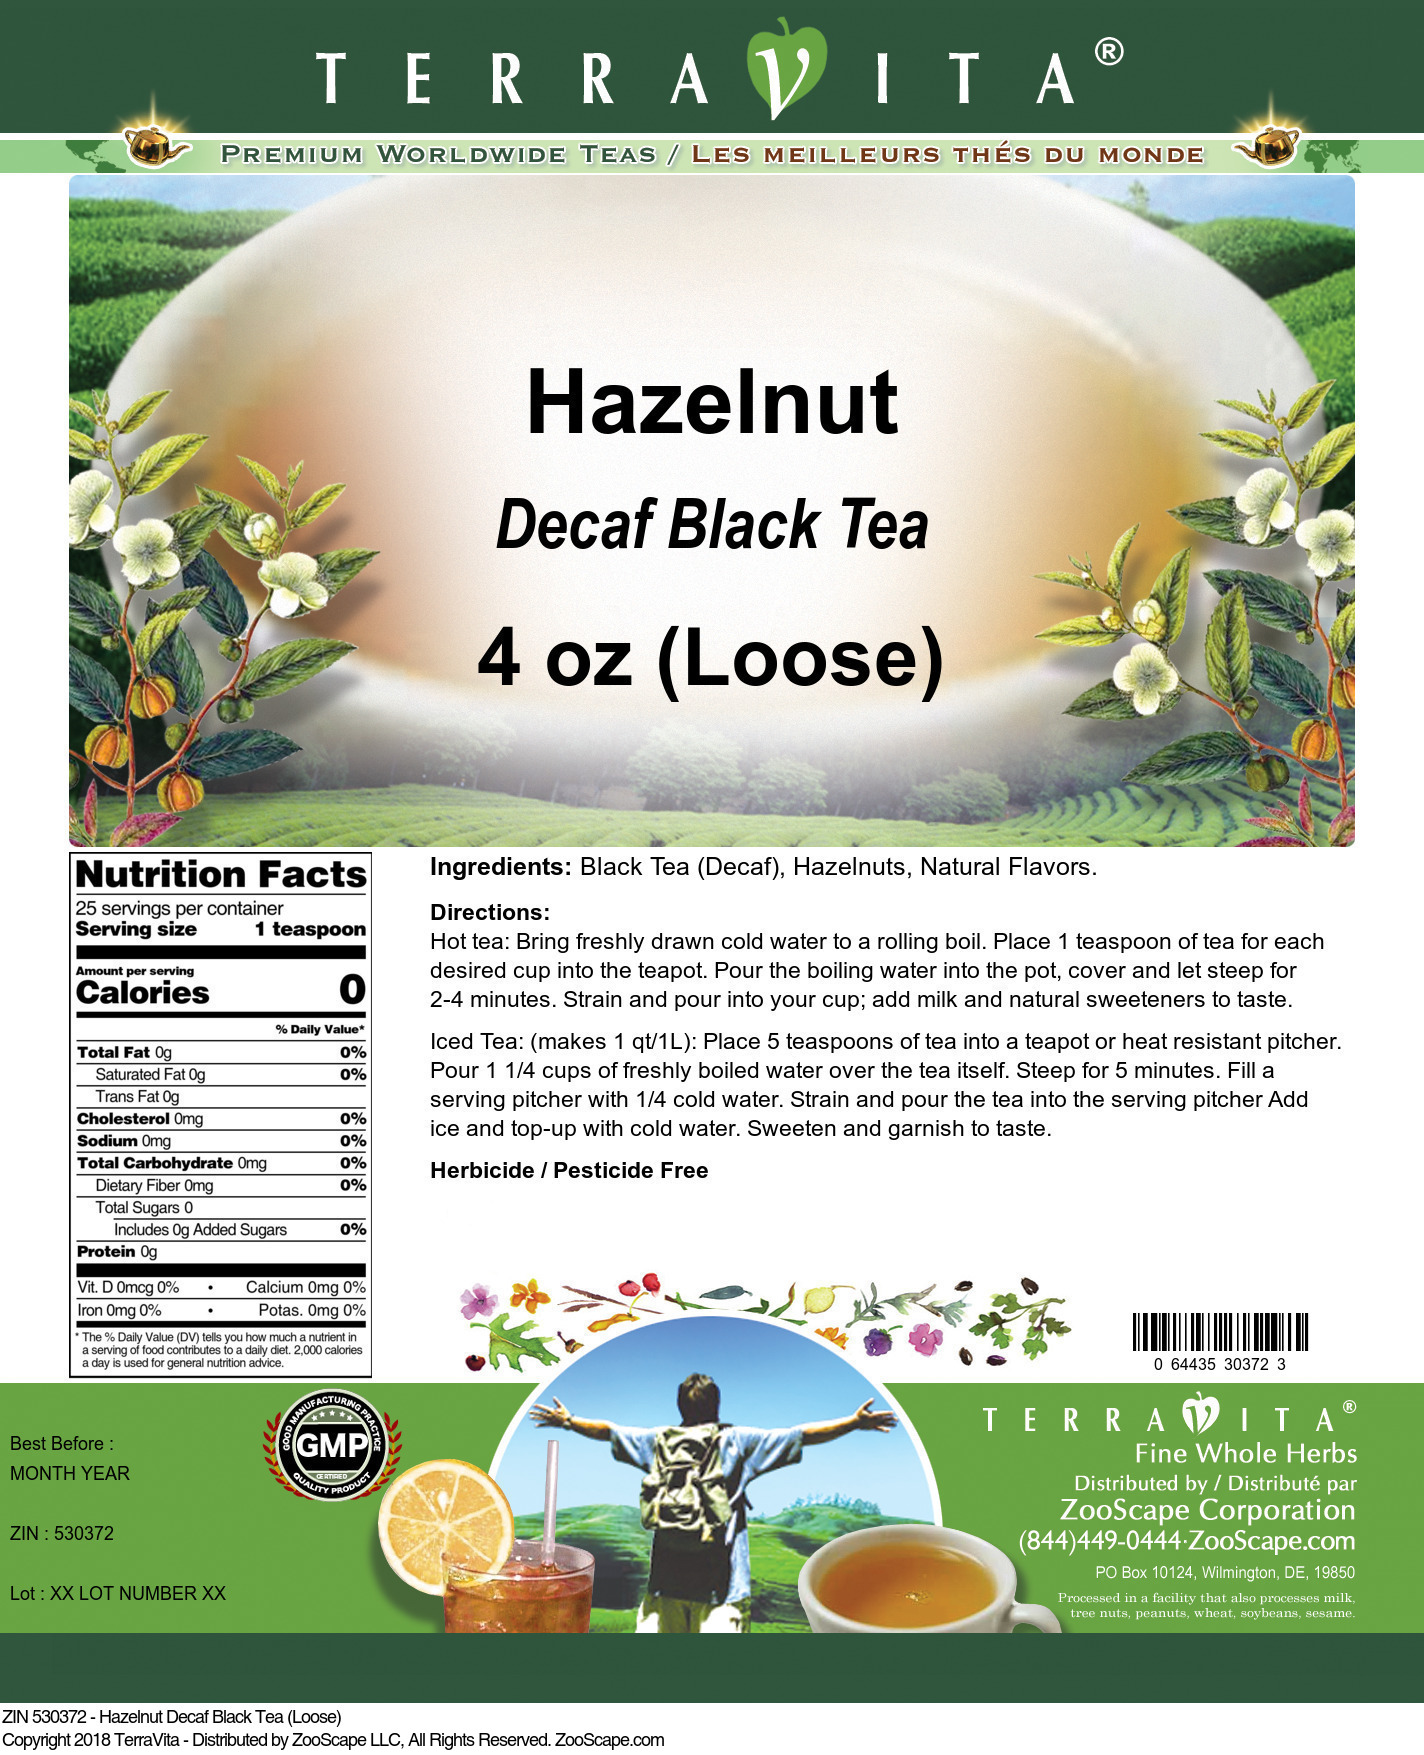 Hazelnut Decaf Black Tea